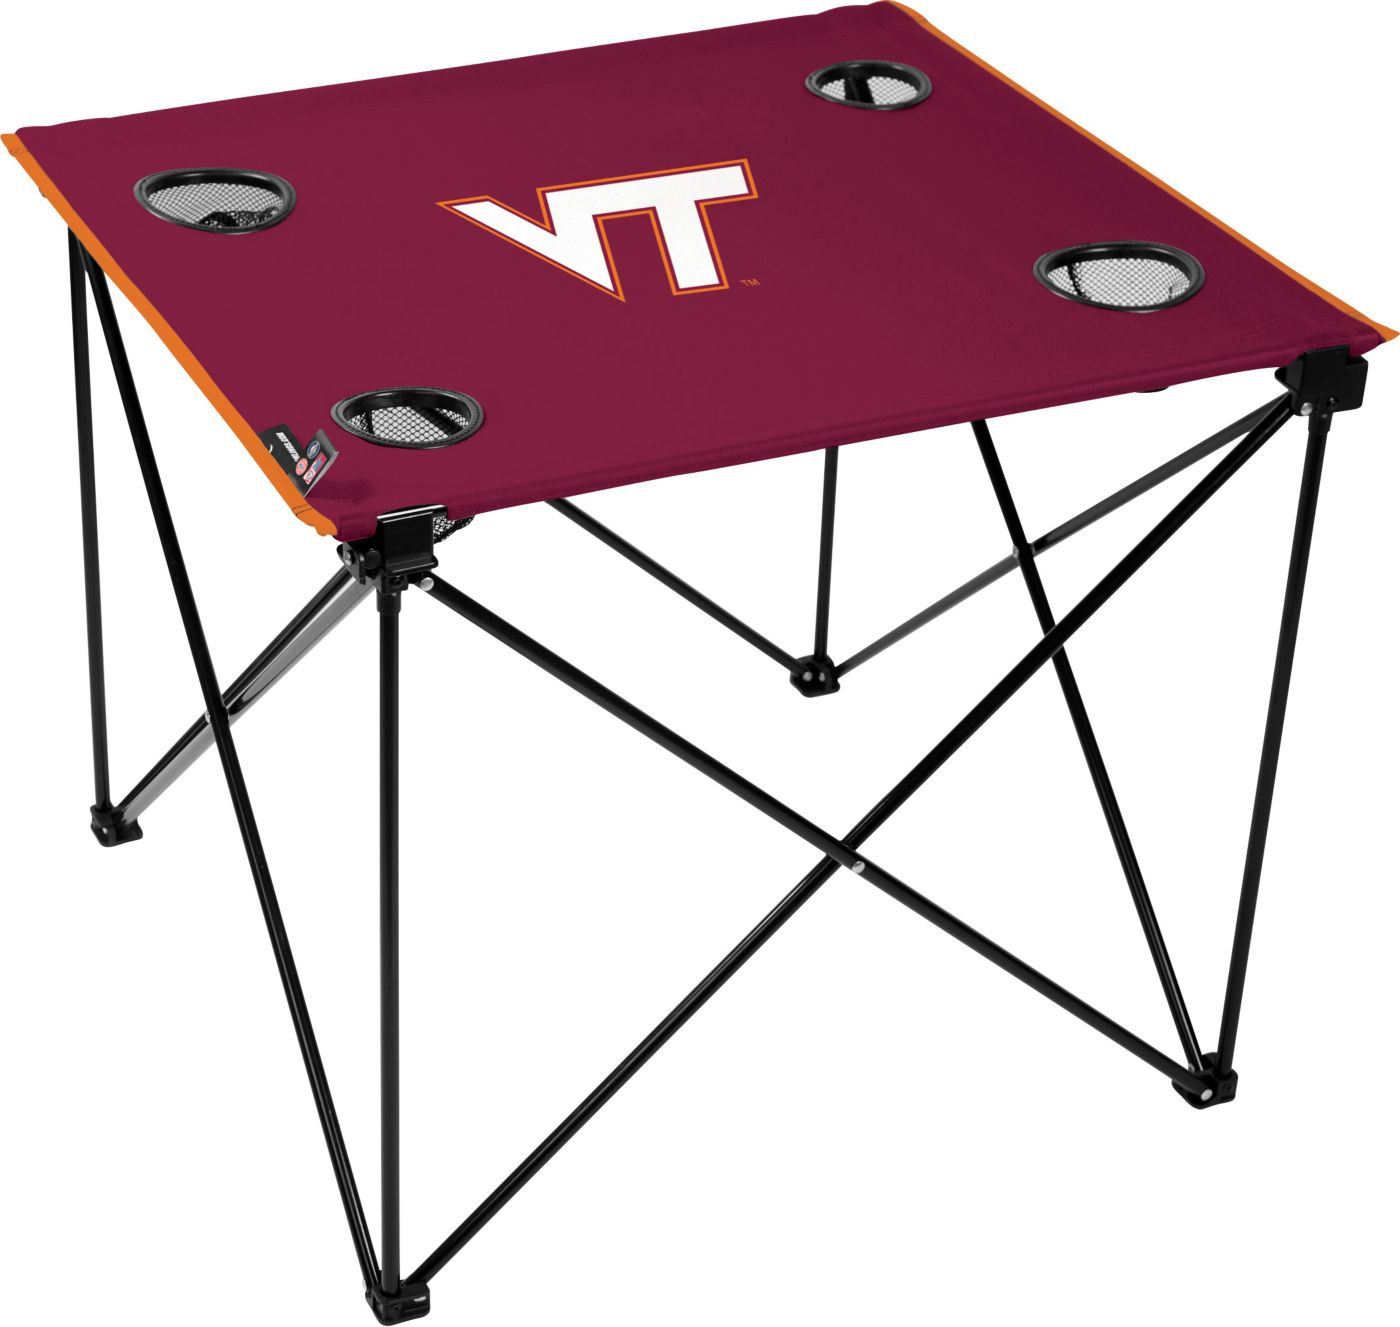 Rawlings Virginia Tech Hokies Deluxe TLG8 Table